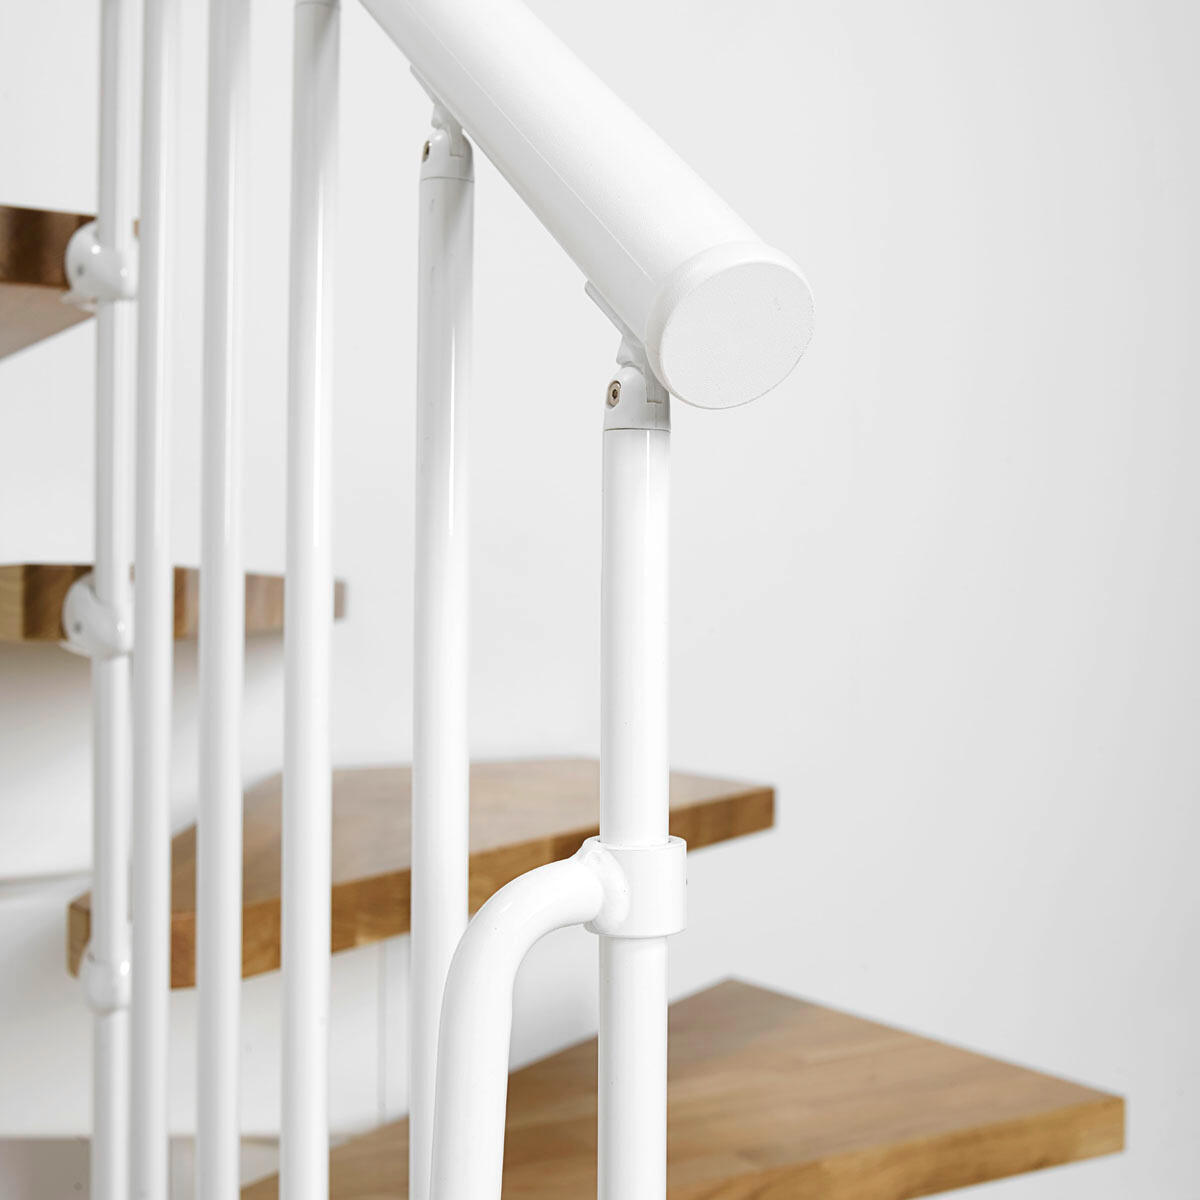 Scala a rampa due quarti di giro OAK90 FONTANOT L 70 cm, gradino rovere, struttura bianco - 3